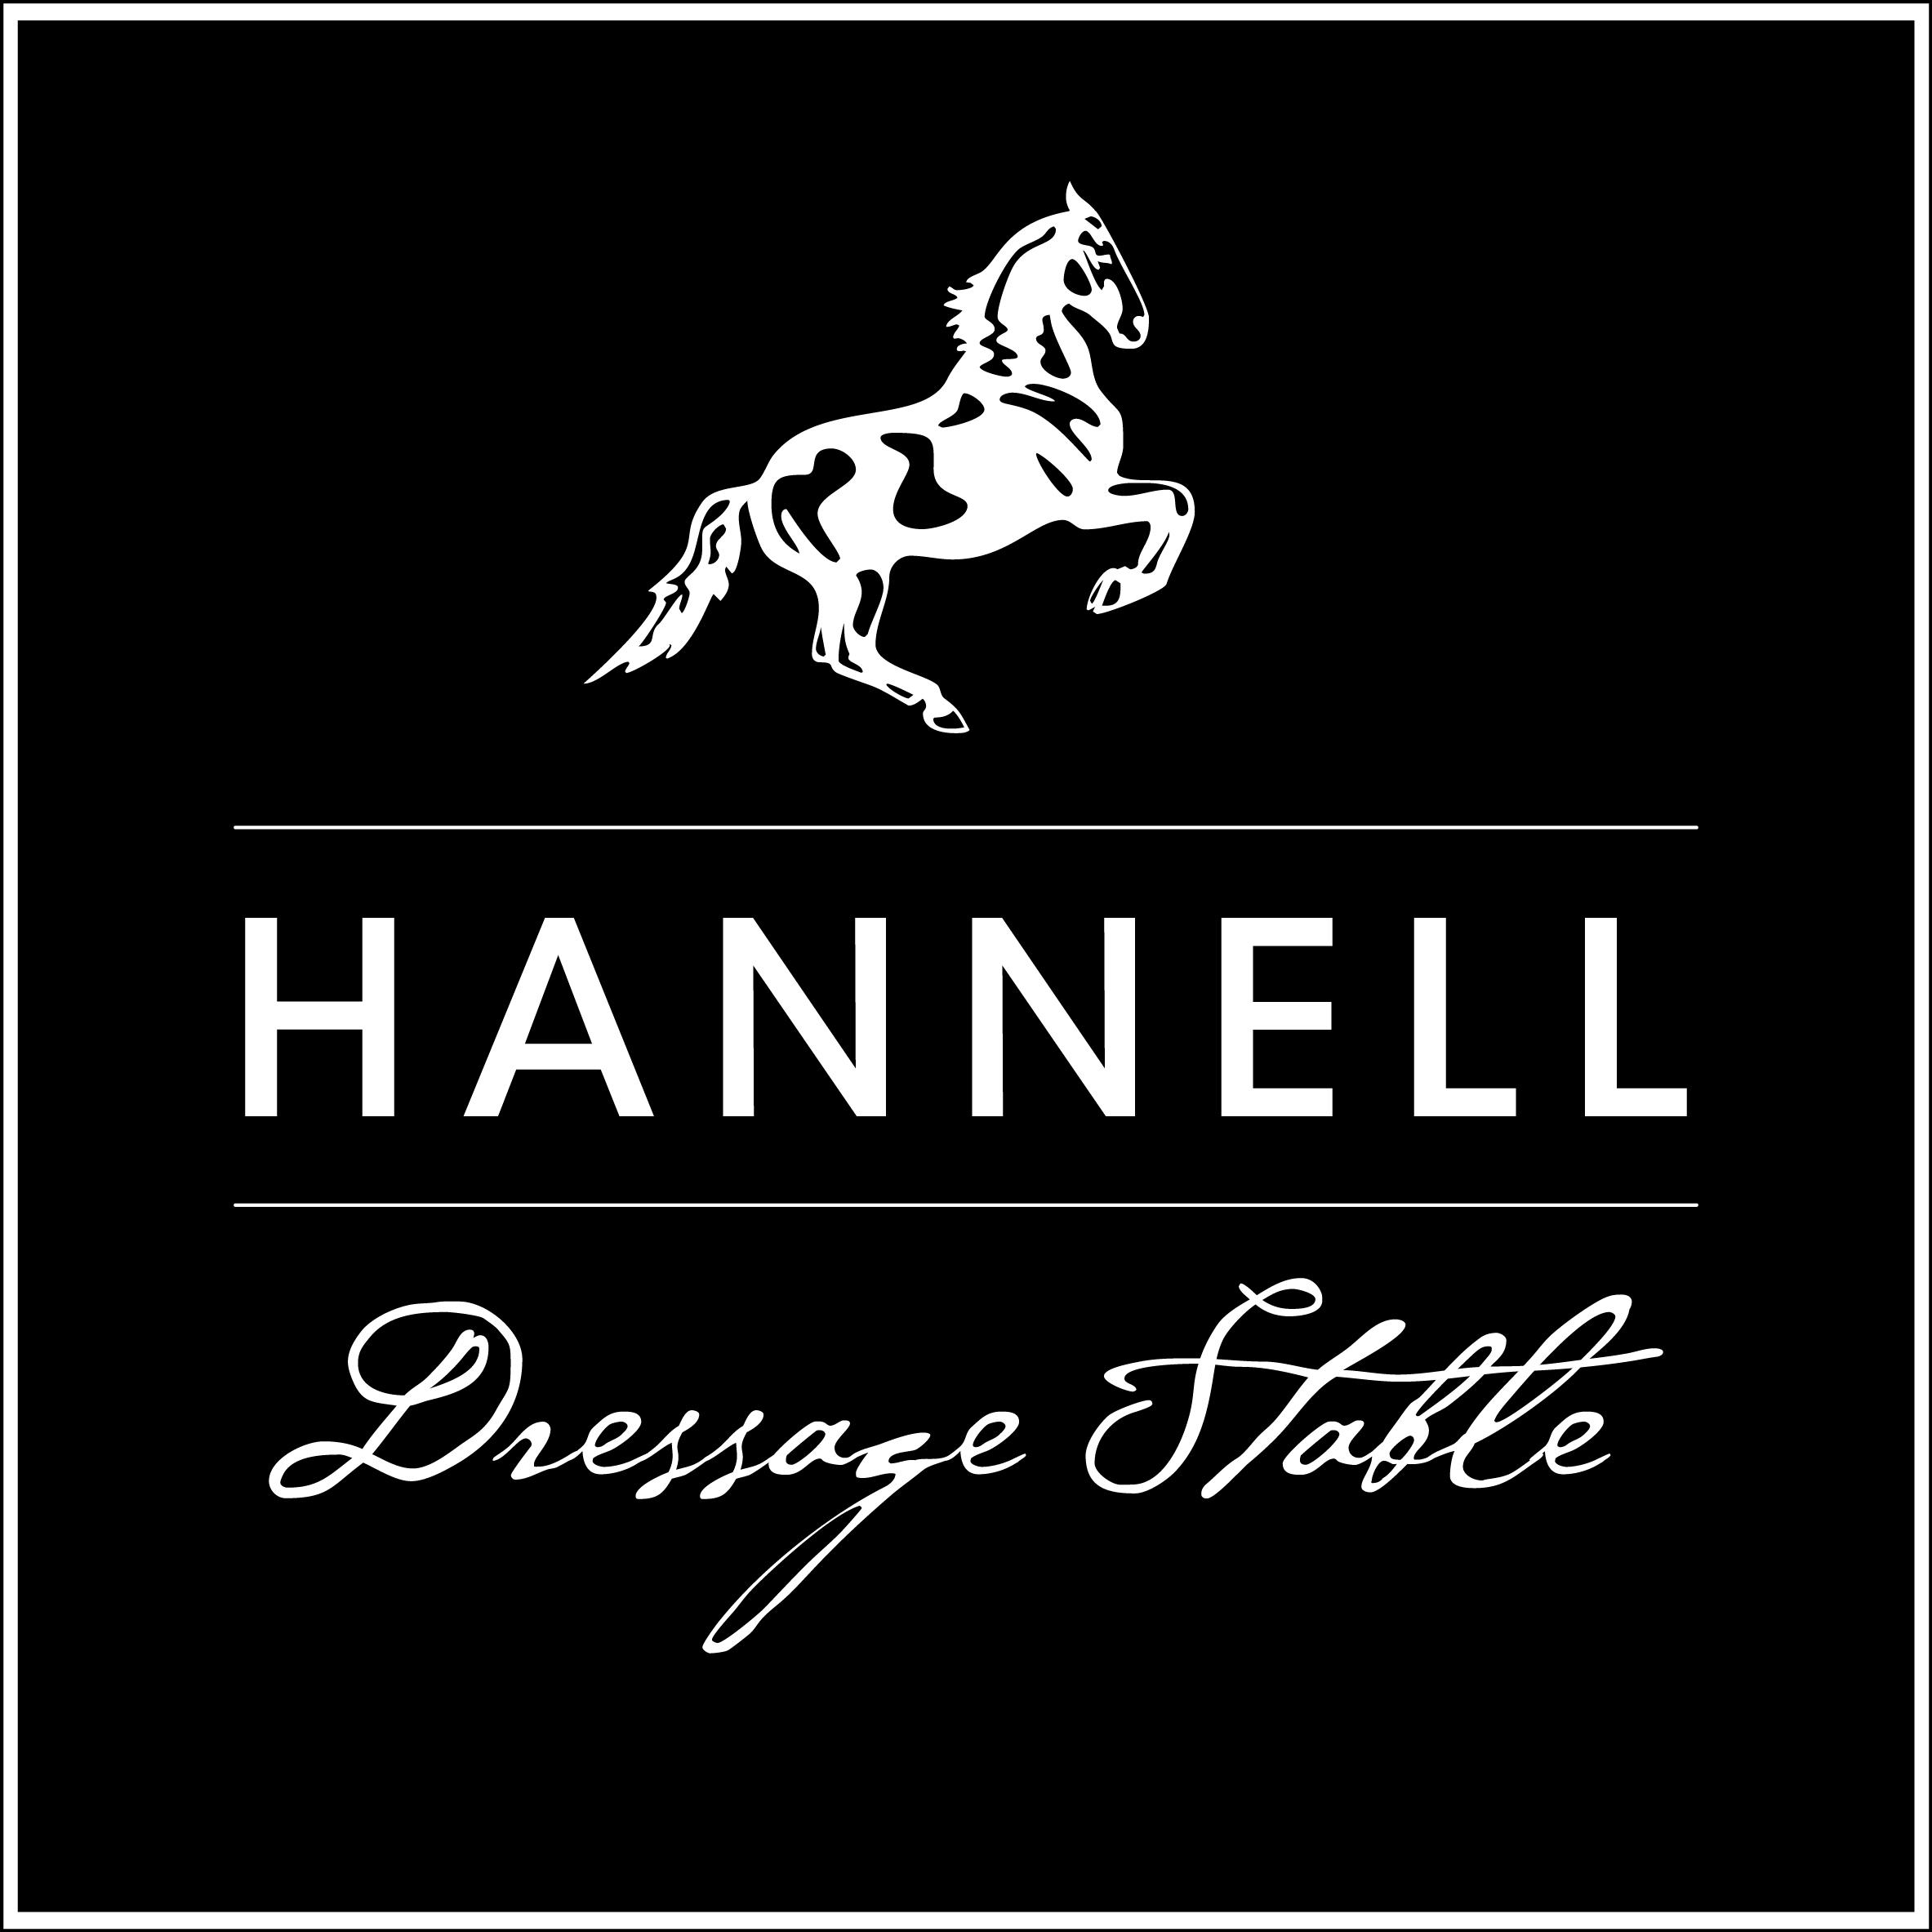 Hannell.jpg